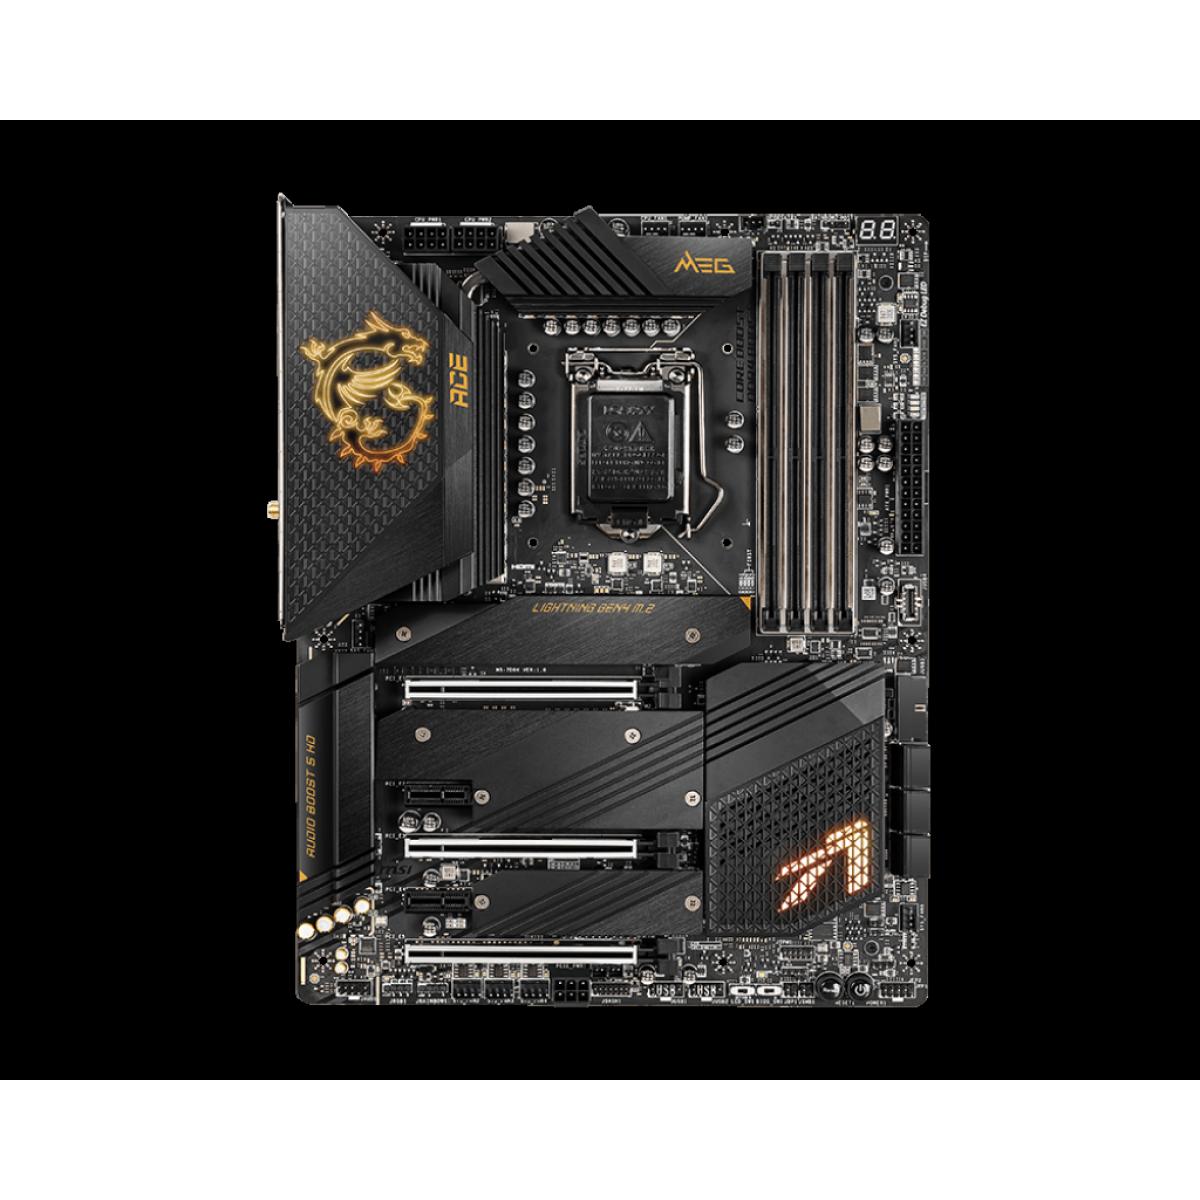 Placa Mãe MSI Z590 ACE, Chipset Intel Z590, Socket 1200, ATX, DDR4